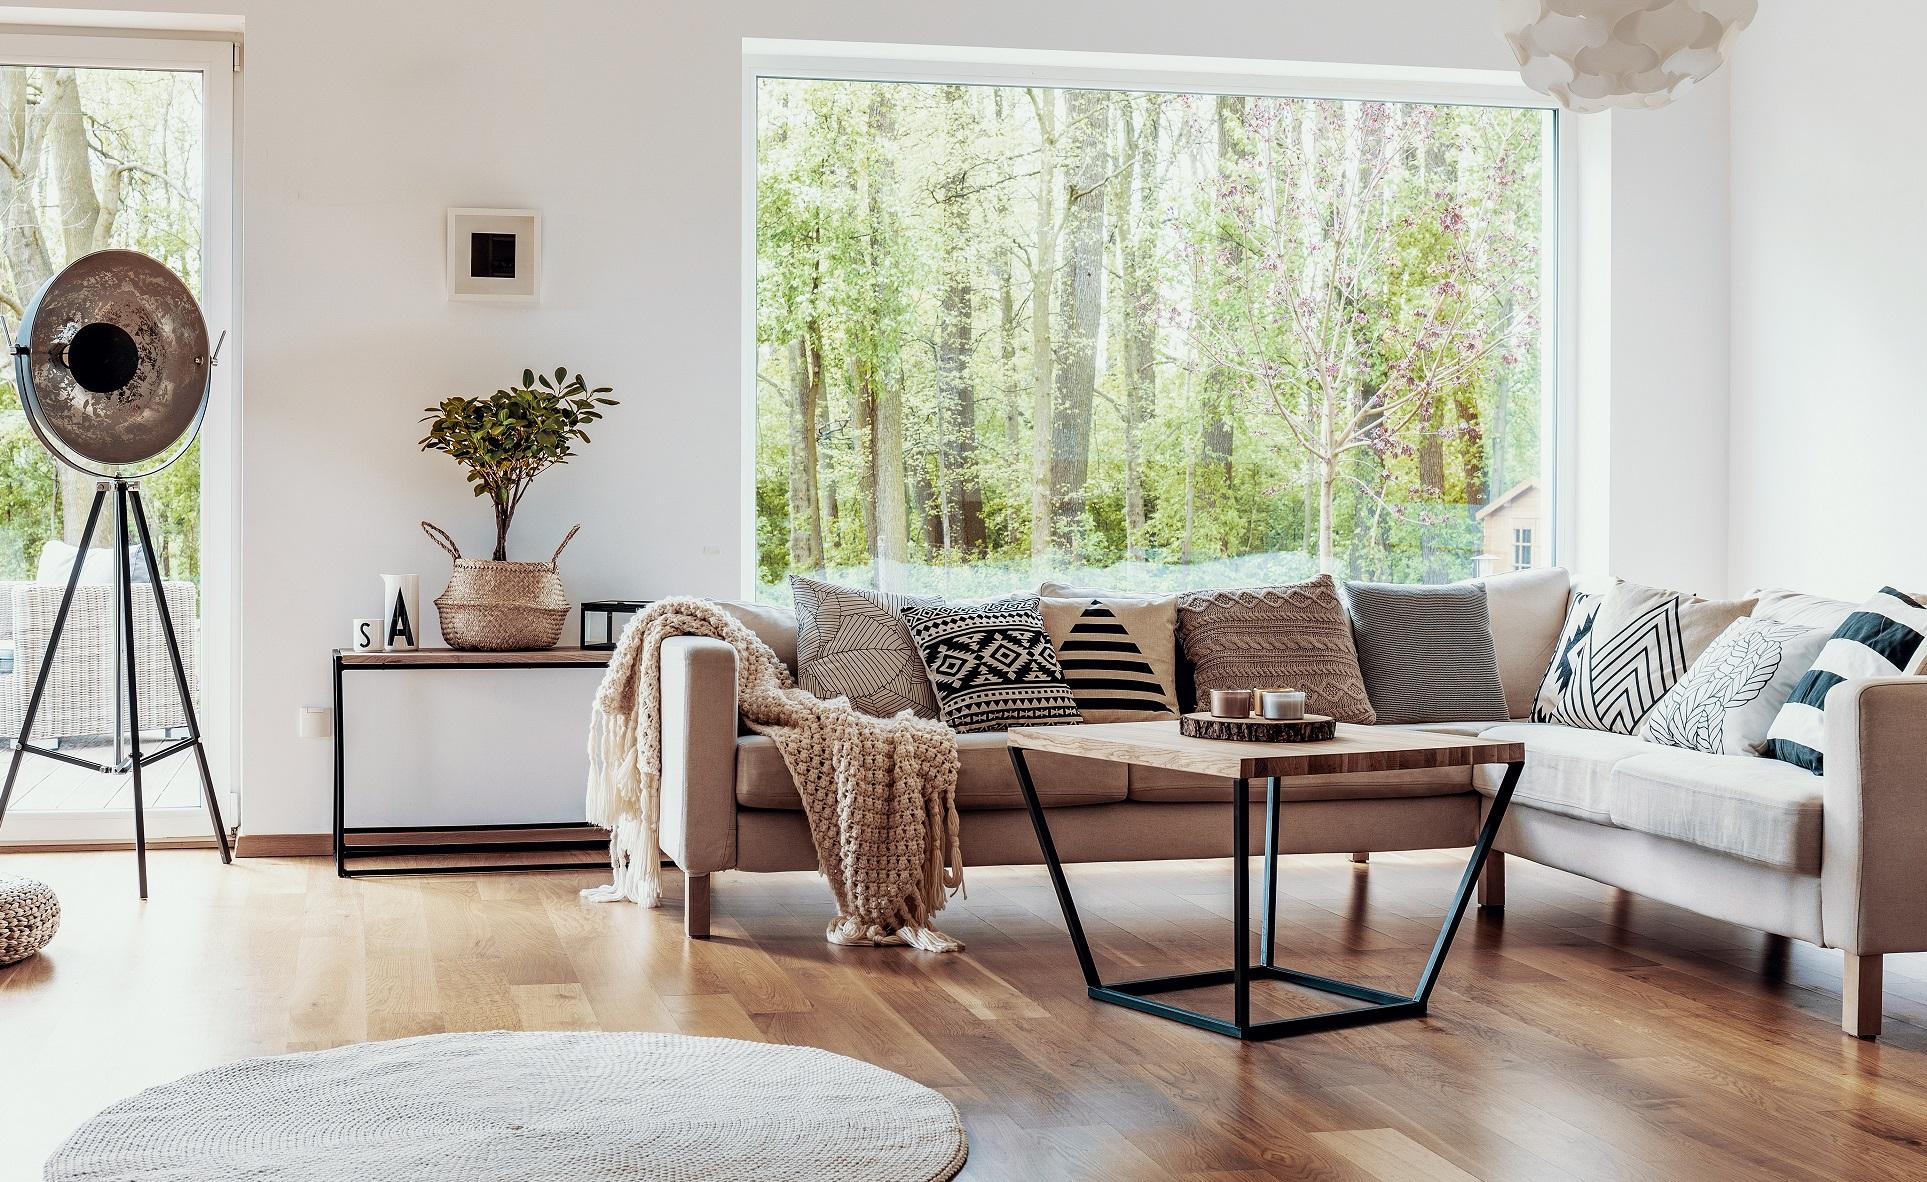 DIY Hybrid Flooring Installation: 4 Helpful Tips to Prepare